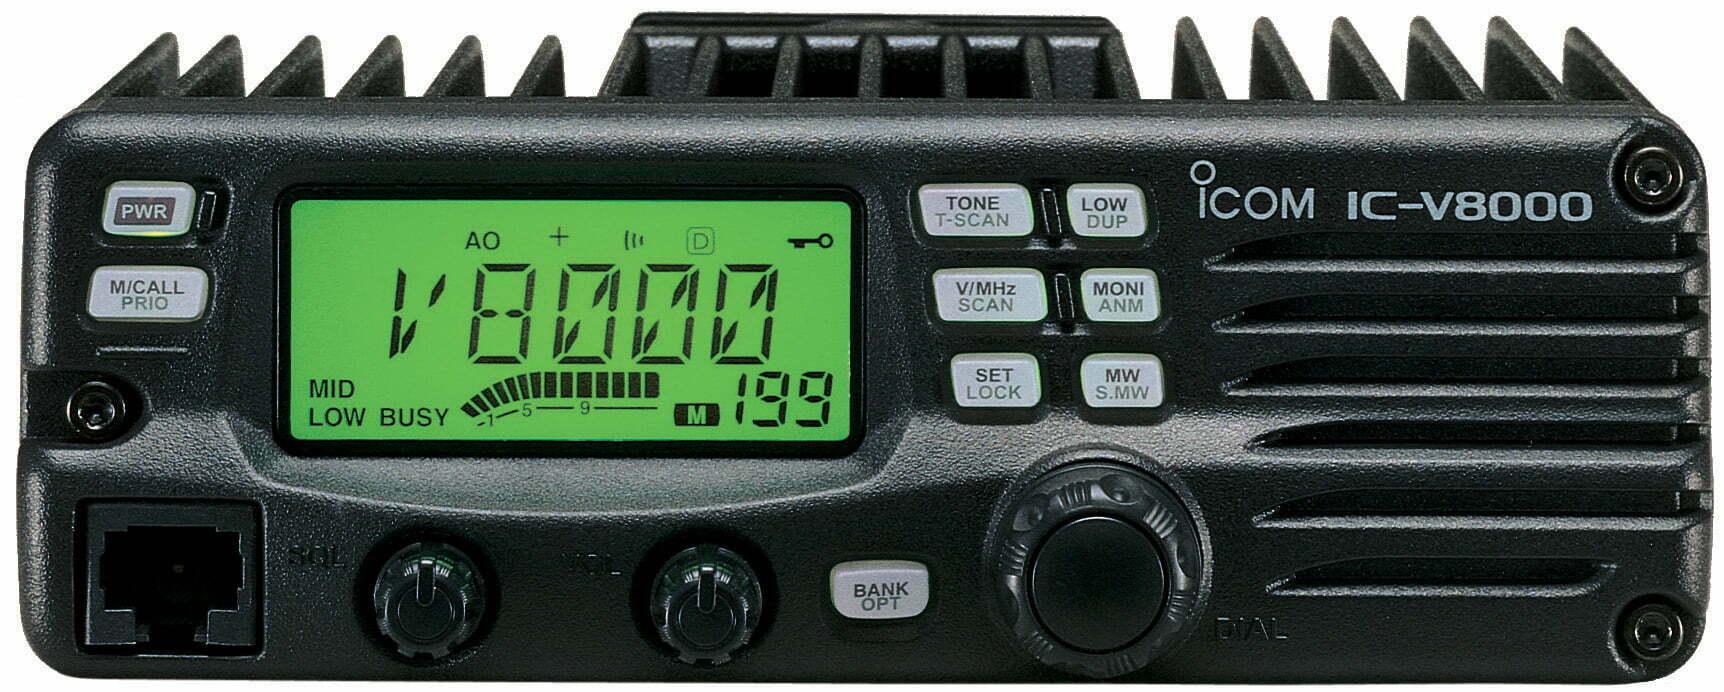 icom ic v8000 service manual dw1zws panda antenna original rh dw1zws com icom ic-v8000 service manual icom ic-v8000 service manual